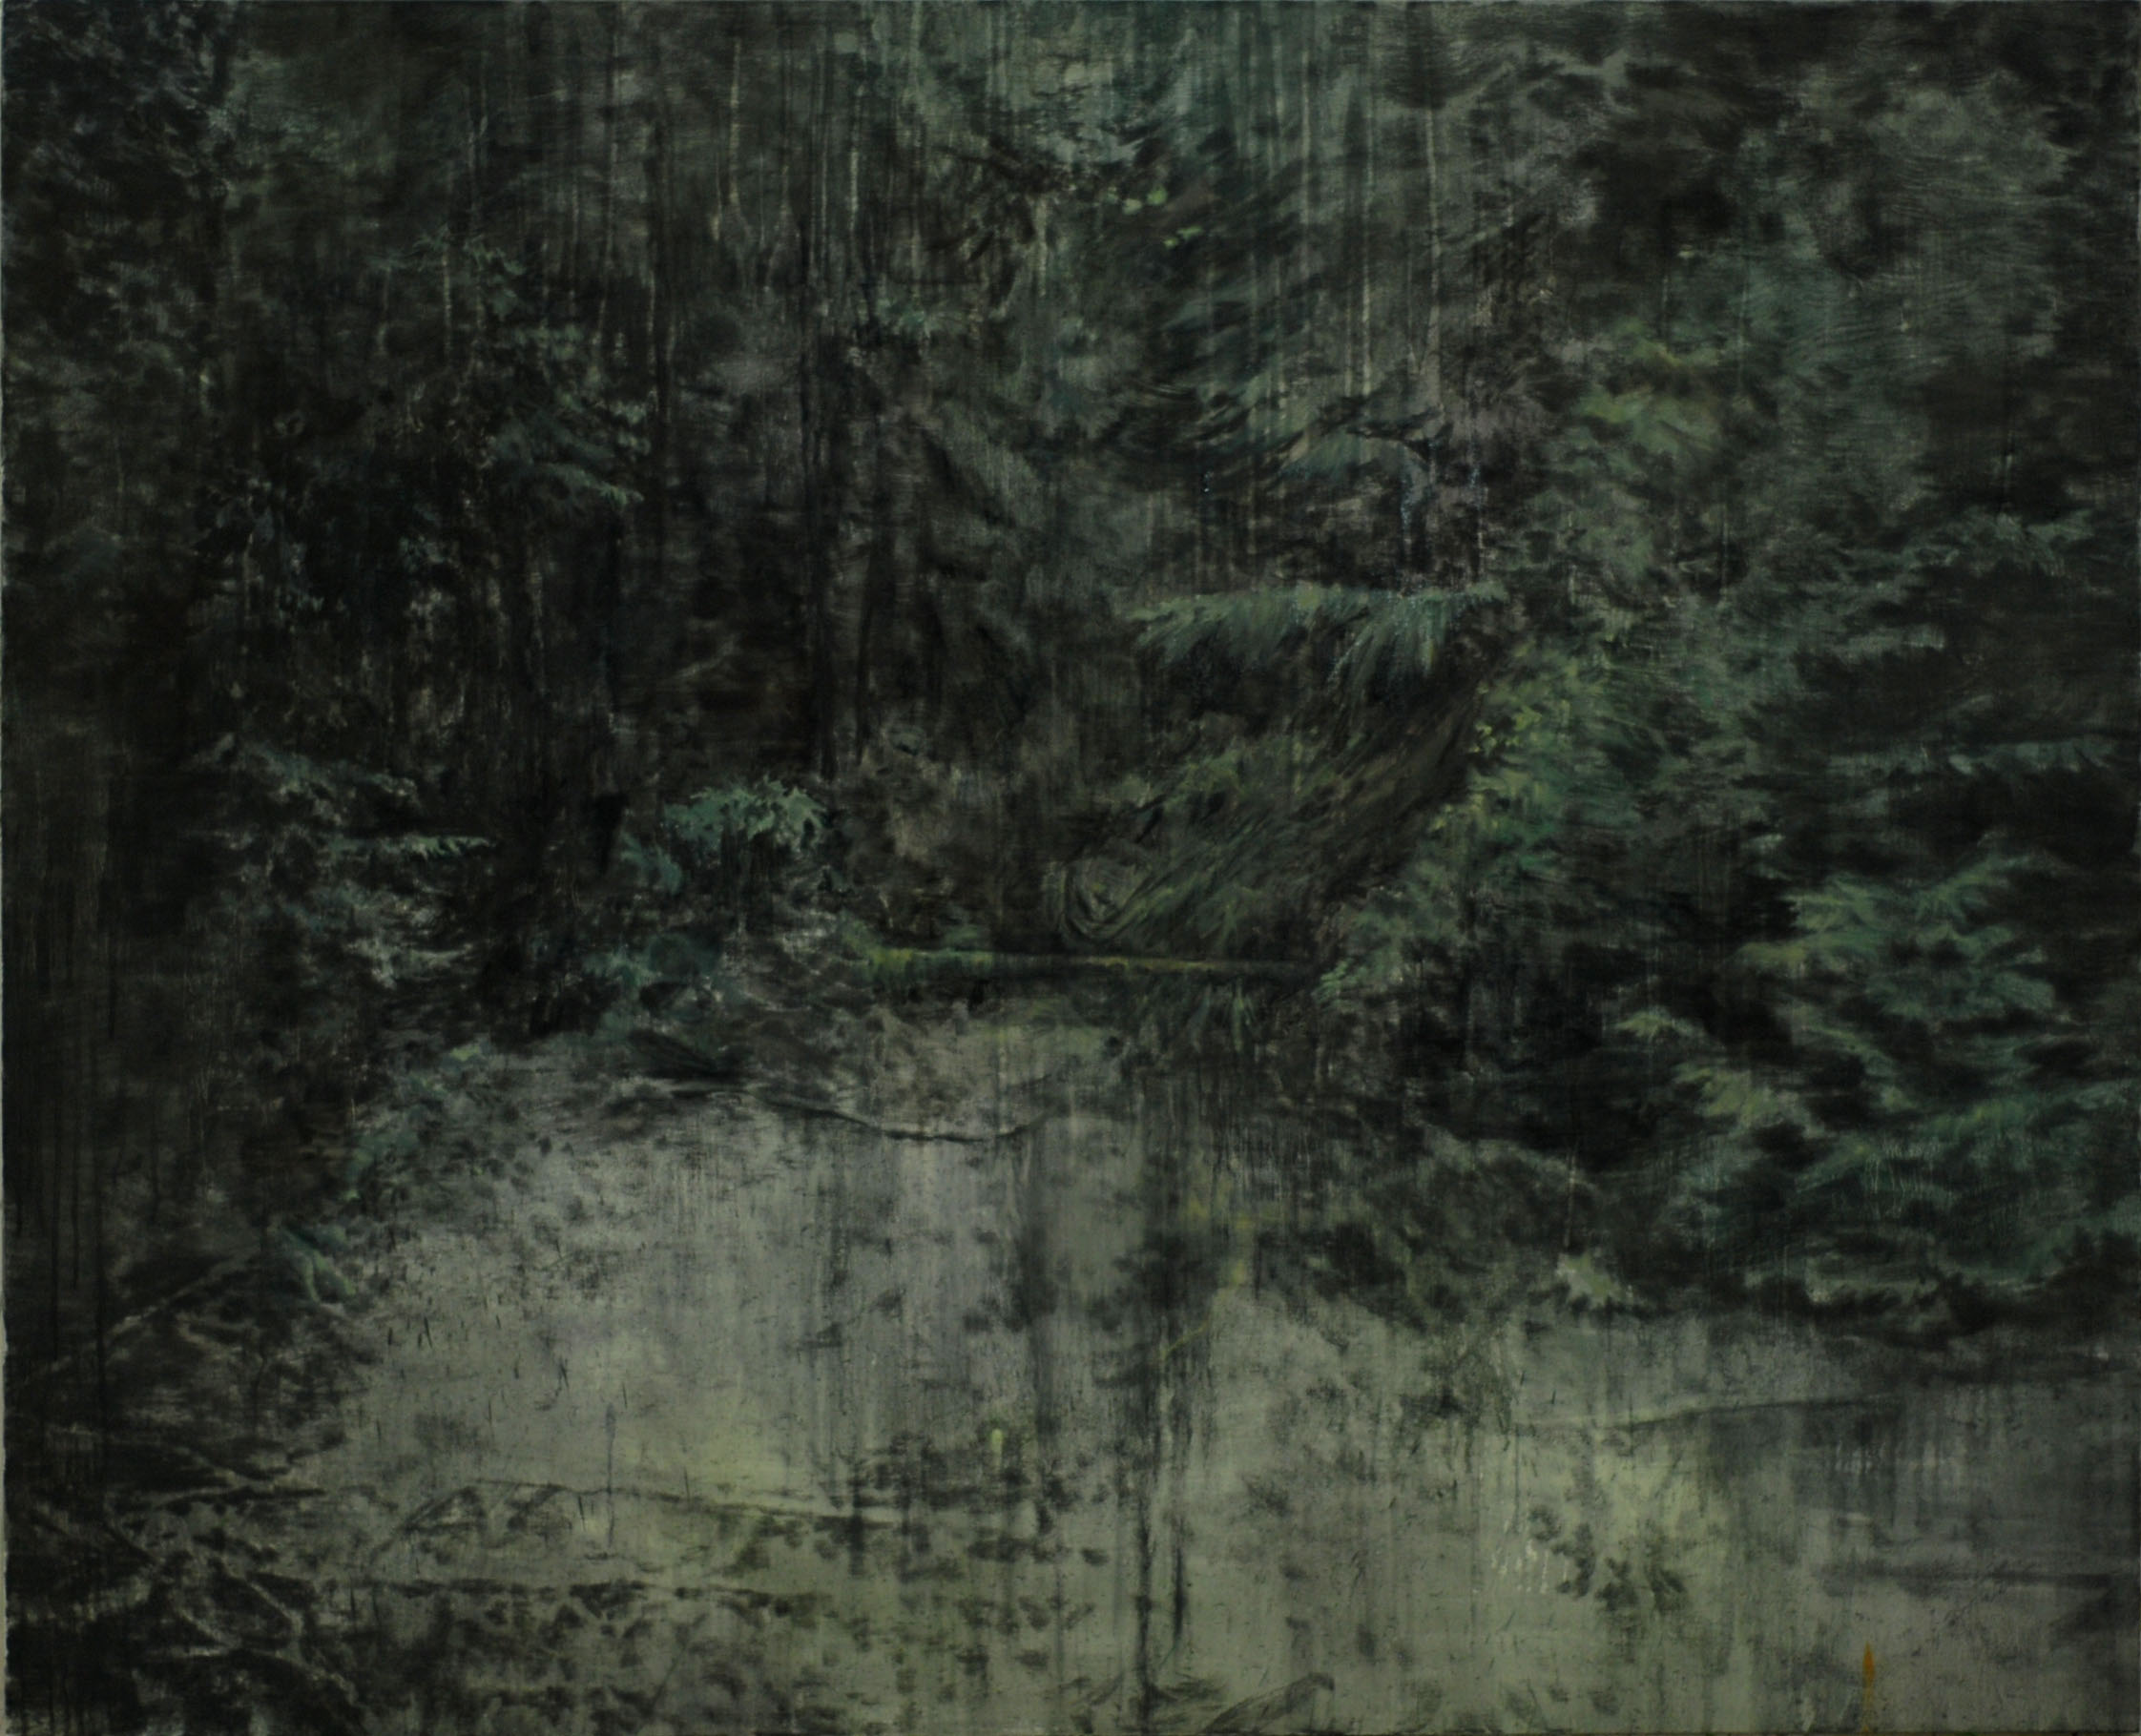 Lu Song 吕松, The Secret Spot, 2011, Oil on canvas 布面油画, 160 x 130 cm